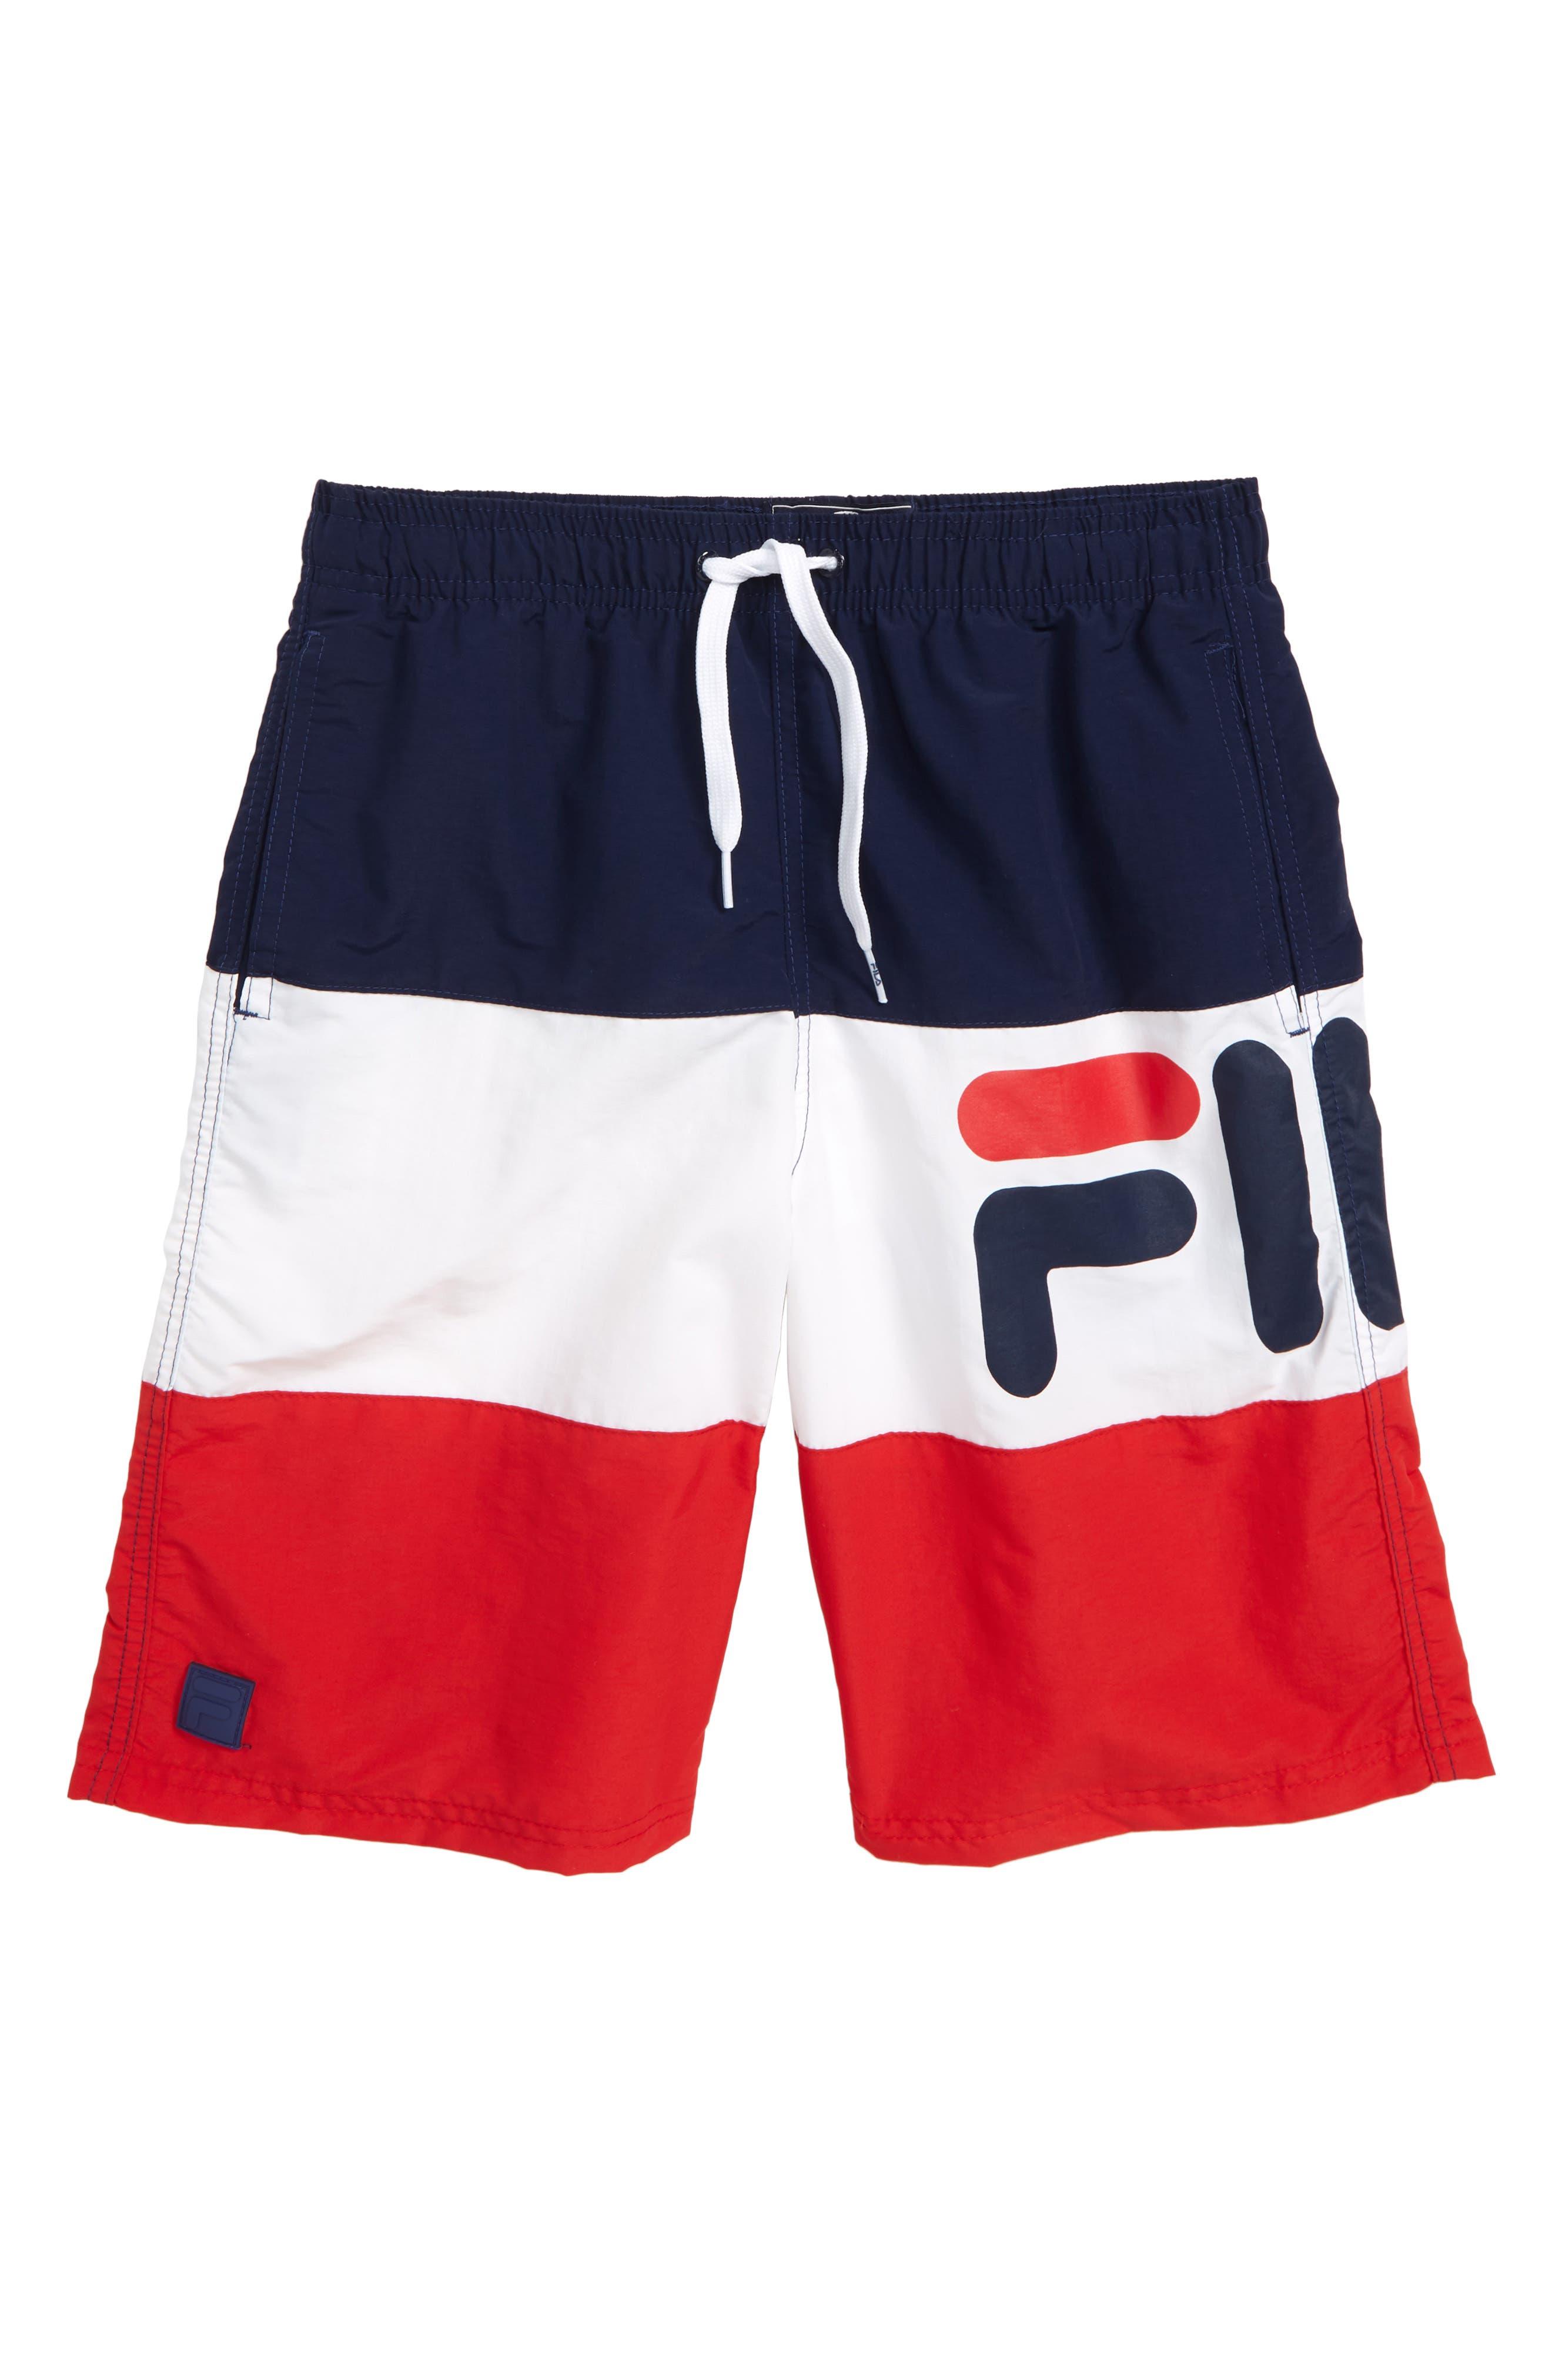 Fila Boys Board Shorts